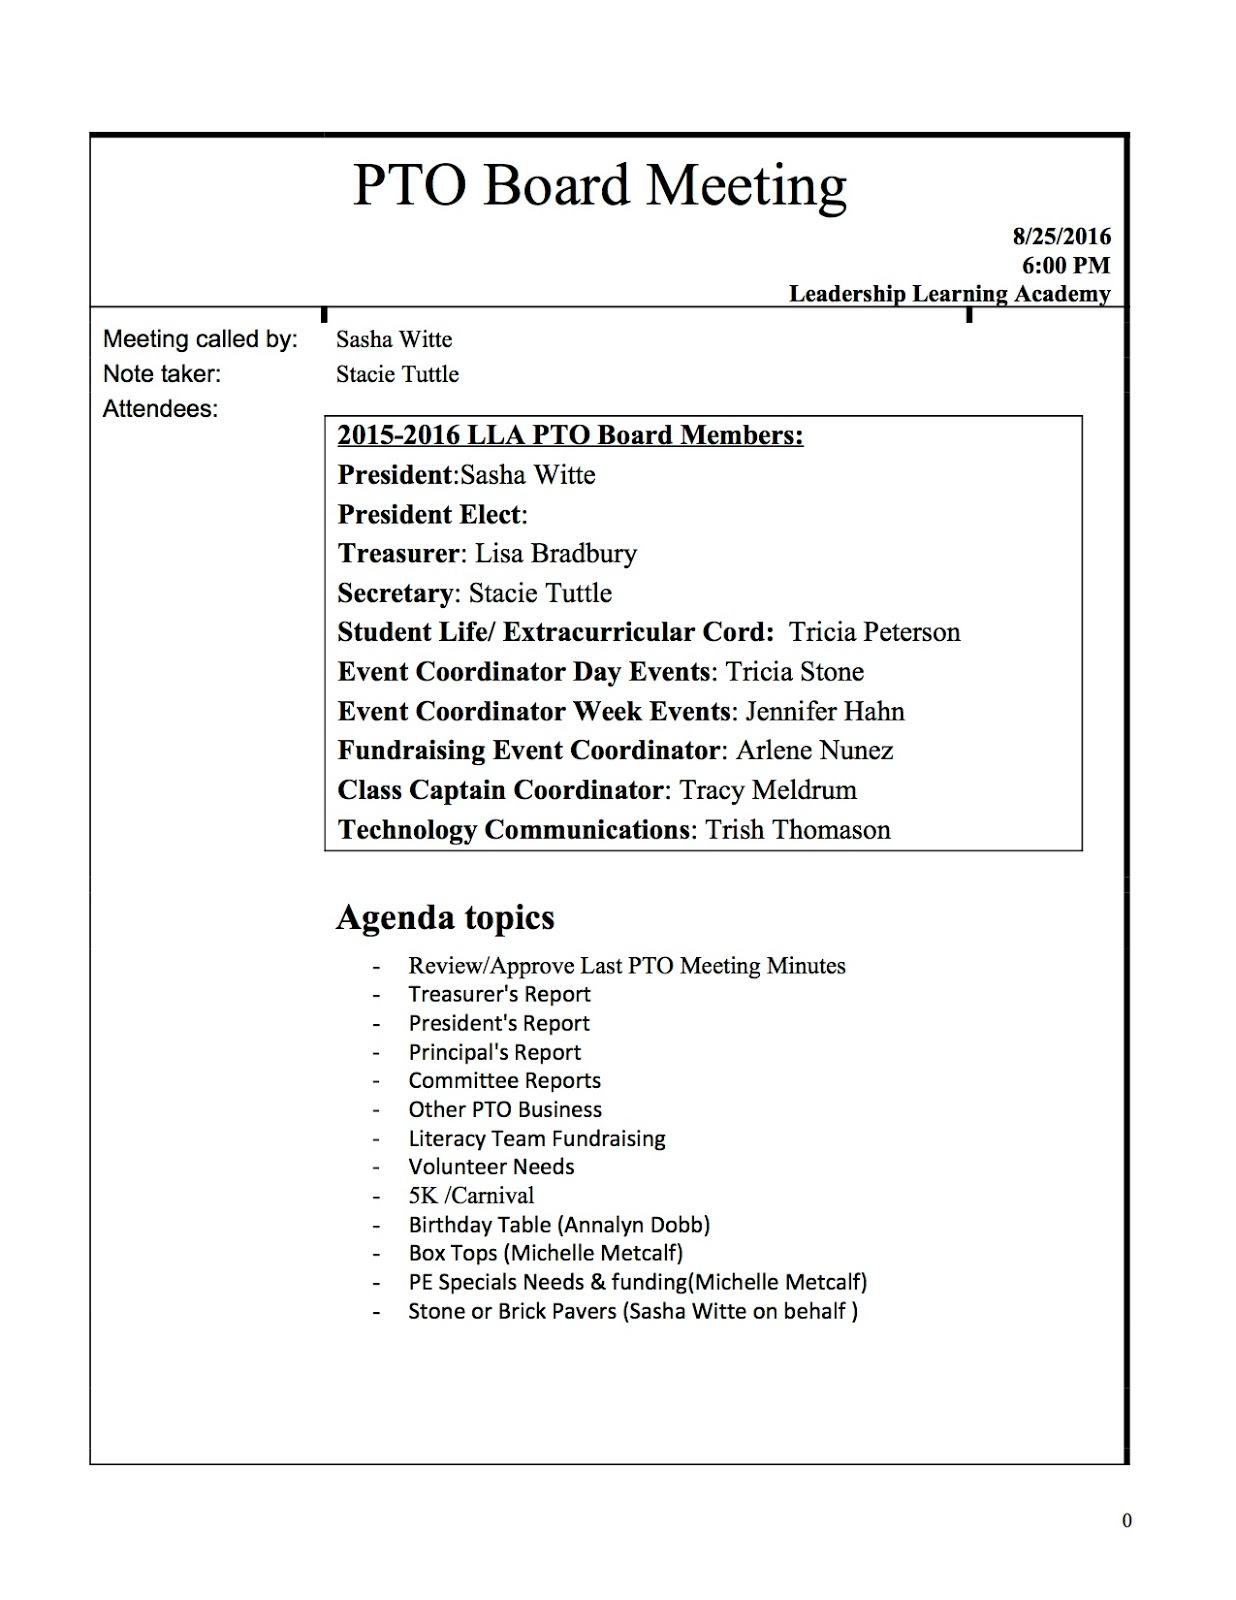 pto agenda template - 28 images - pto meeting agenda sle pto meeting ...